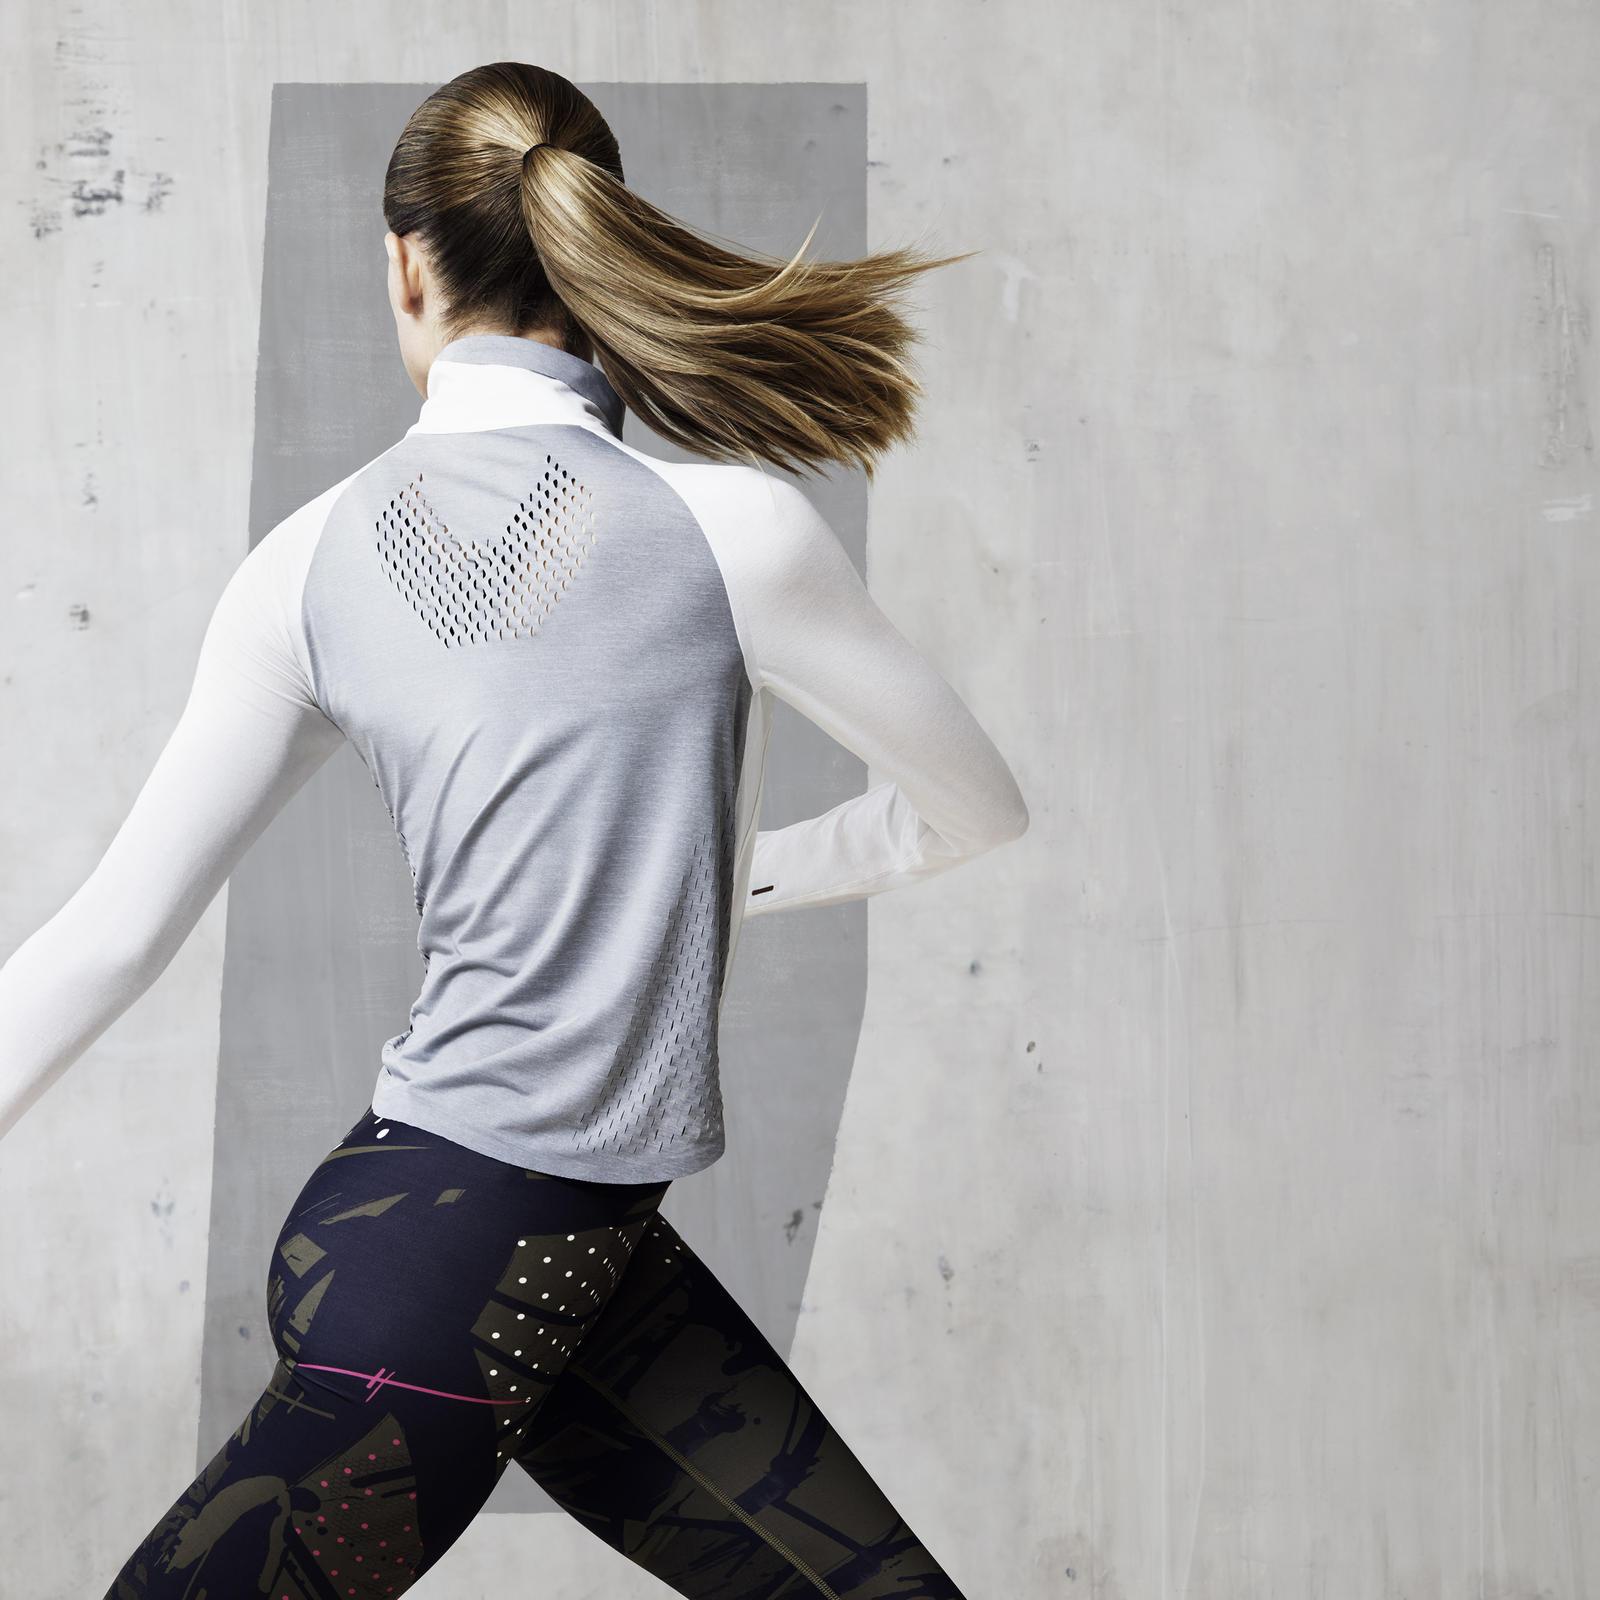 NikeLab x JFS Crop Long Sleeve Top